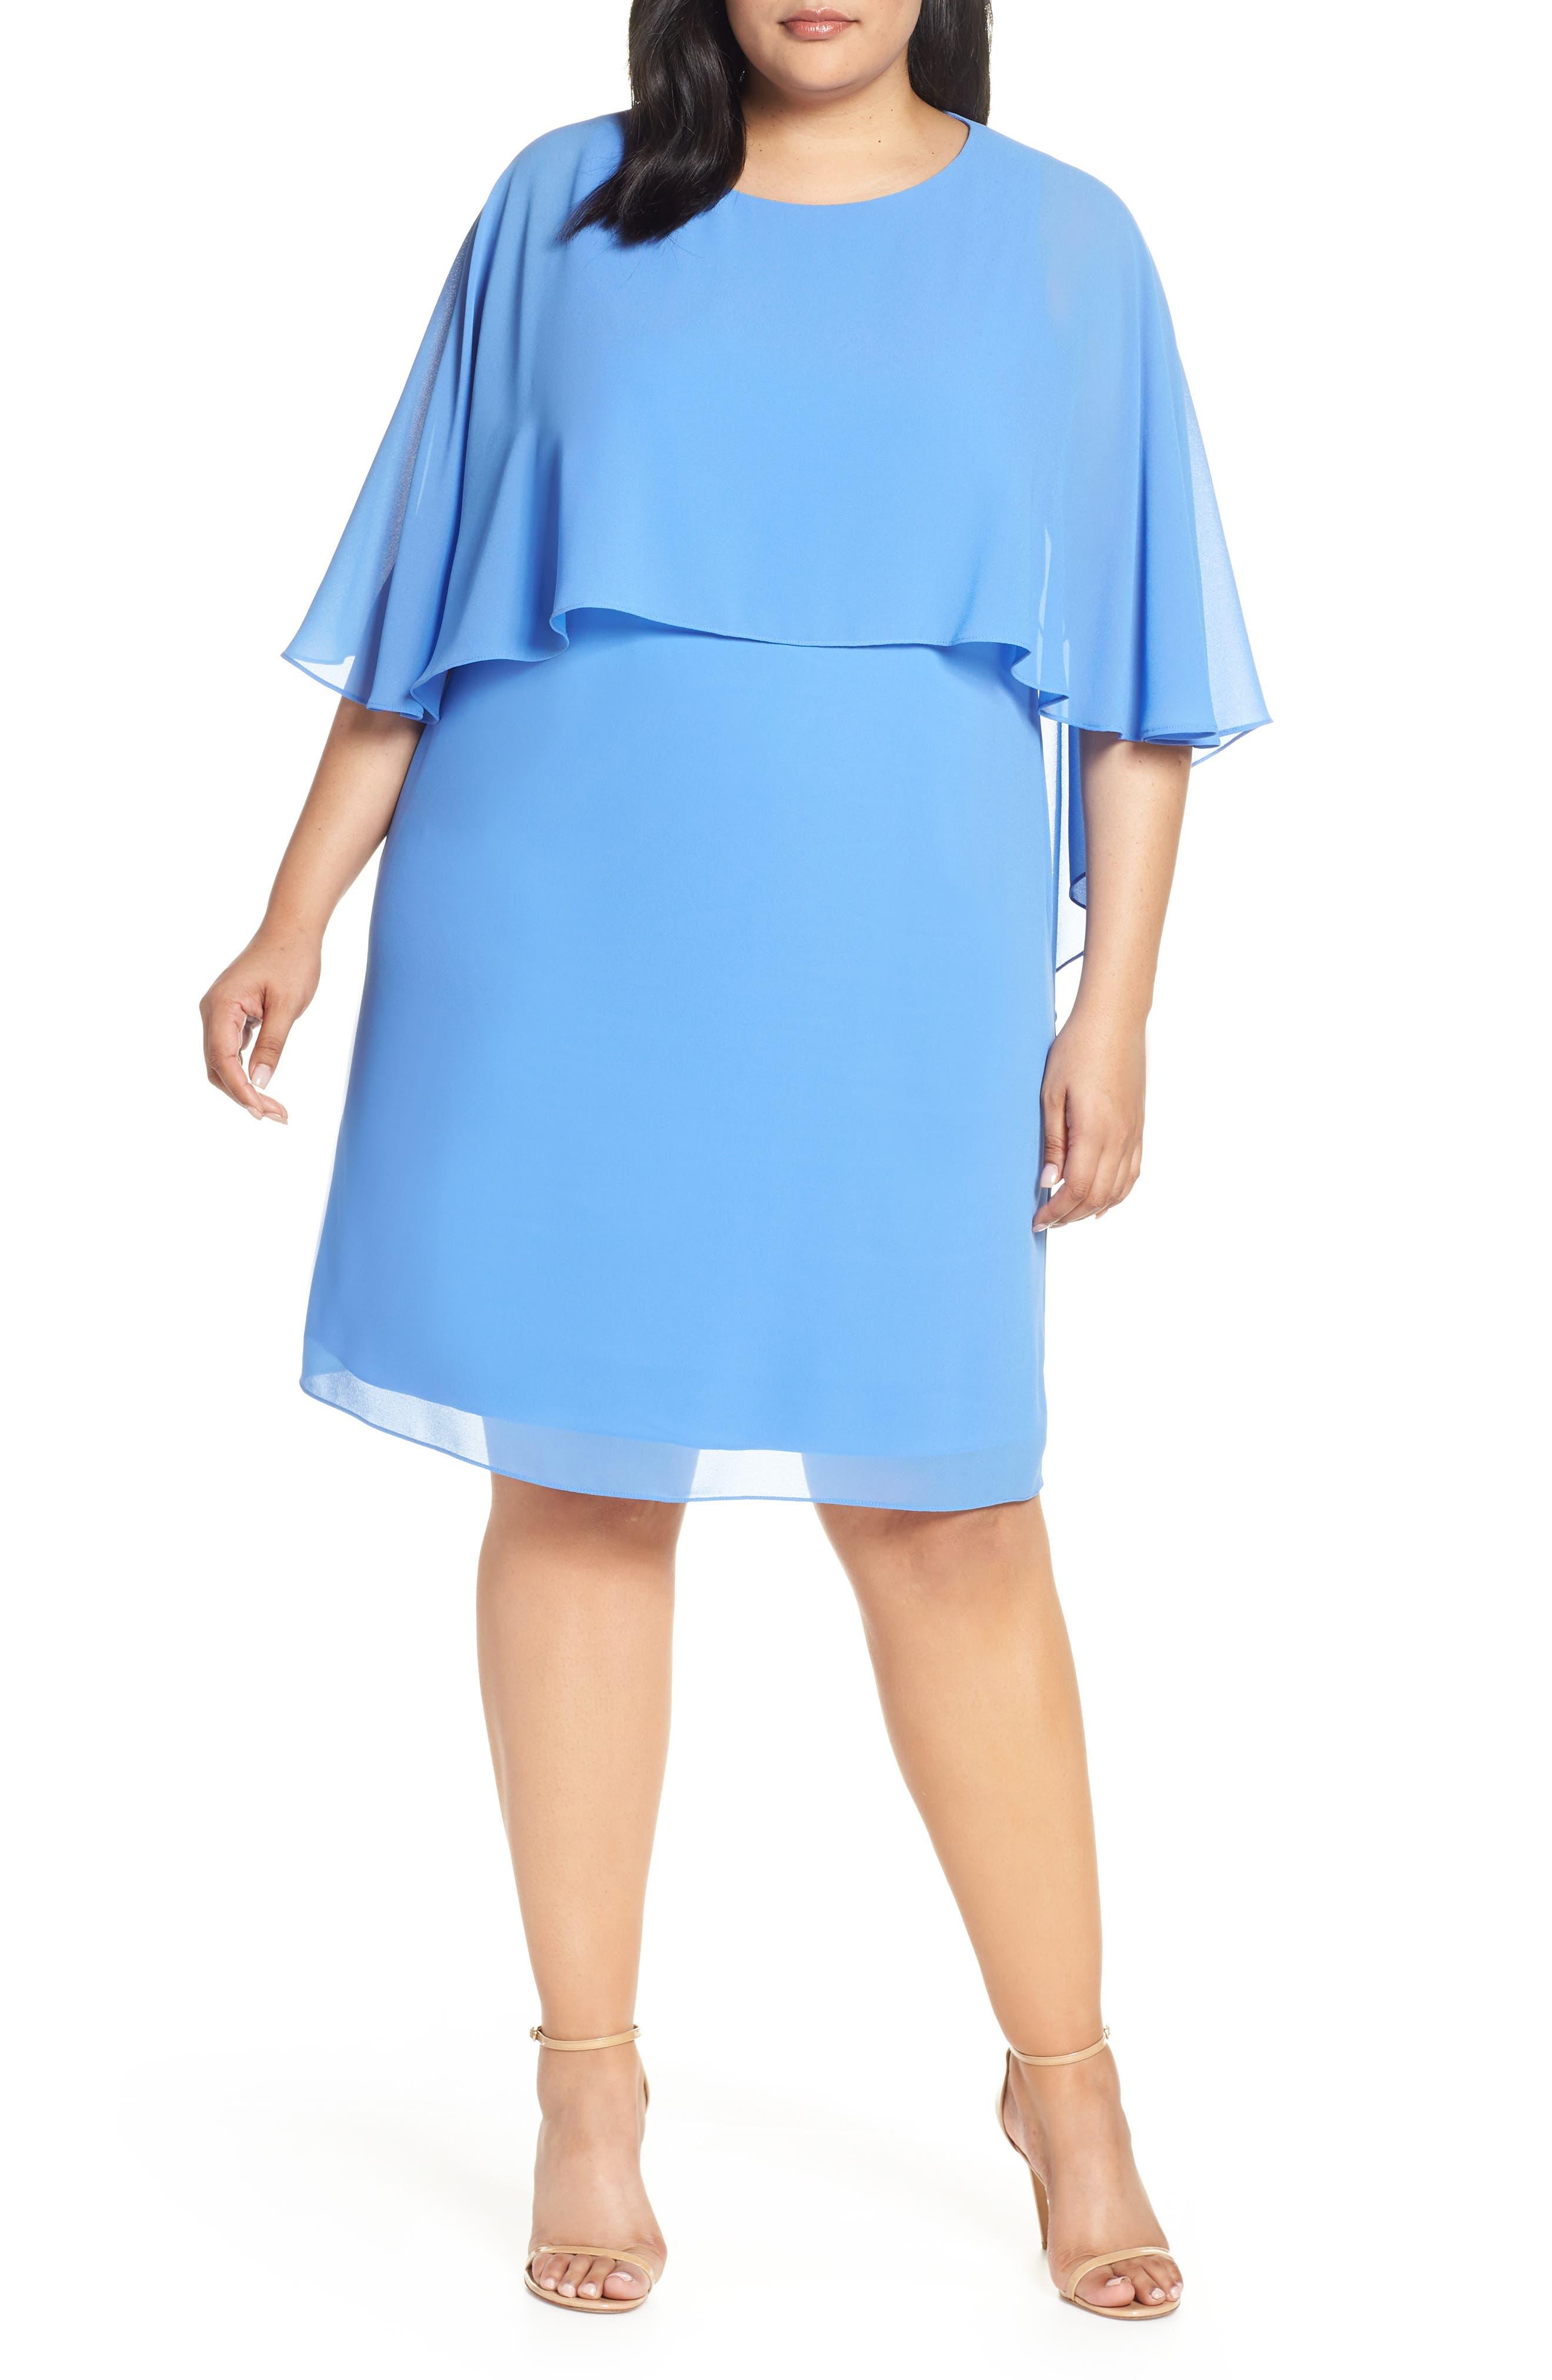 Plus Size Vince Camuto Chiffon Cape Sheath Dress, Blue